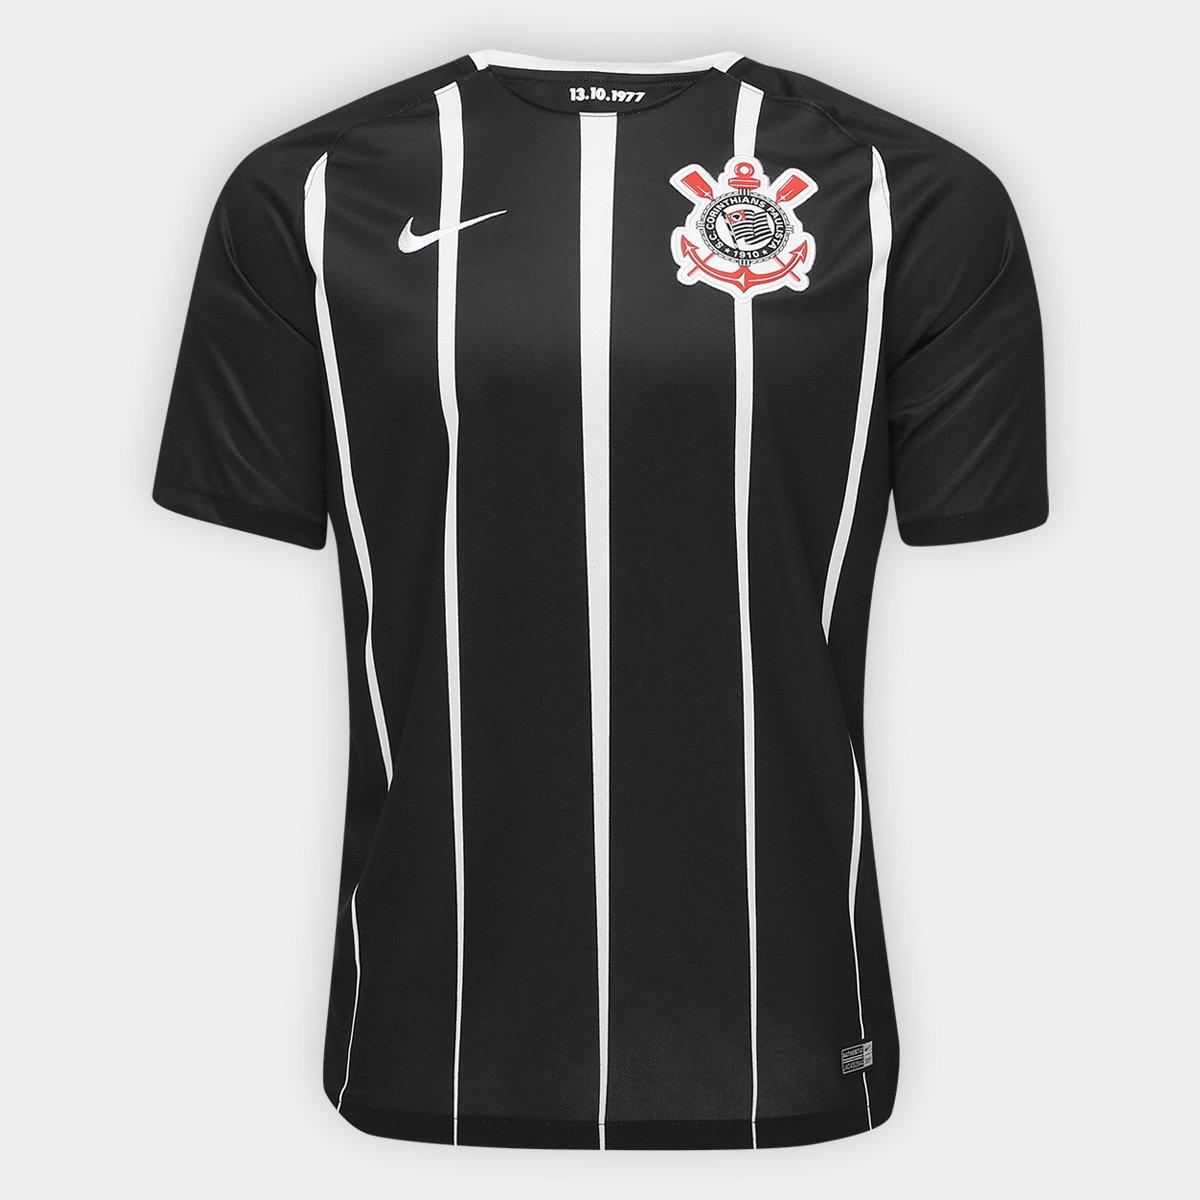 1784d06158f84 Camisa Corinthians II 17 18 s nº Torcedor Nike Masculina - Compre Agora